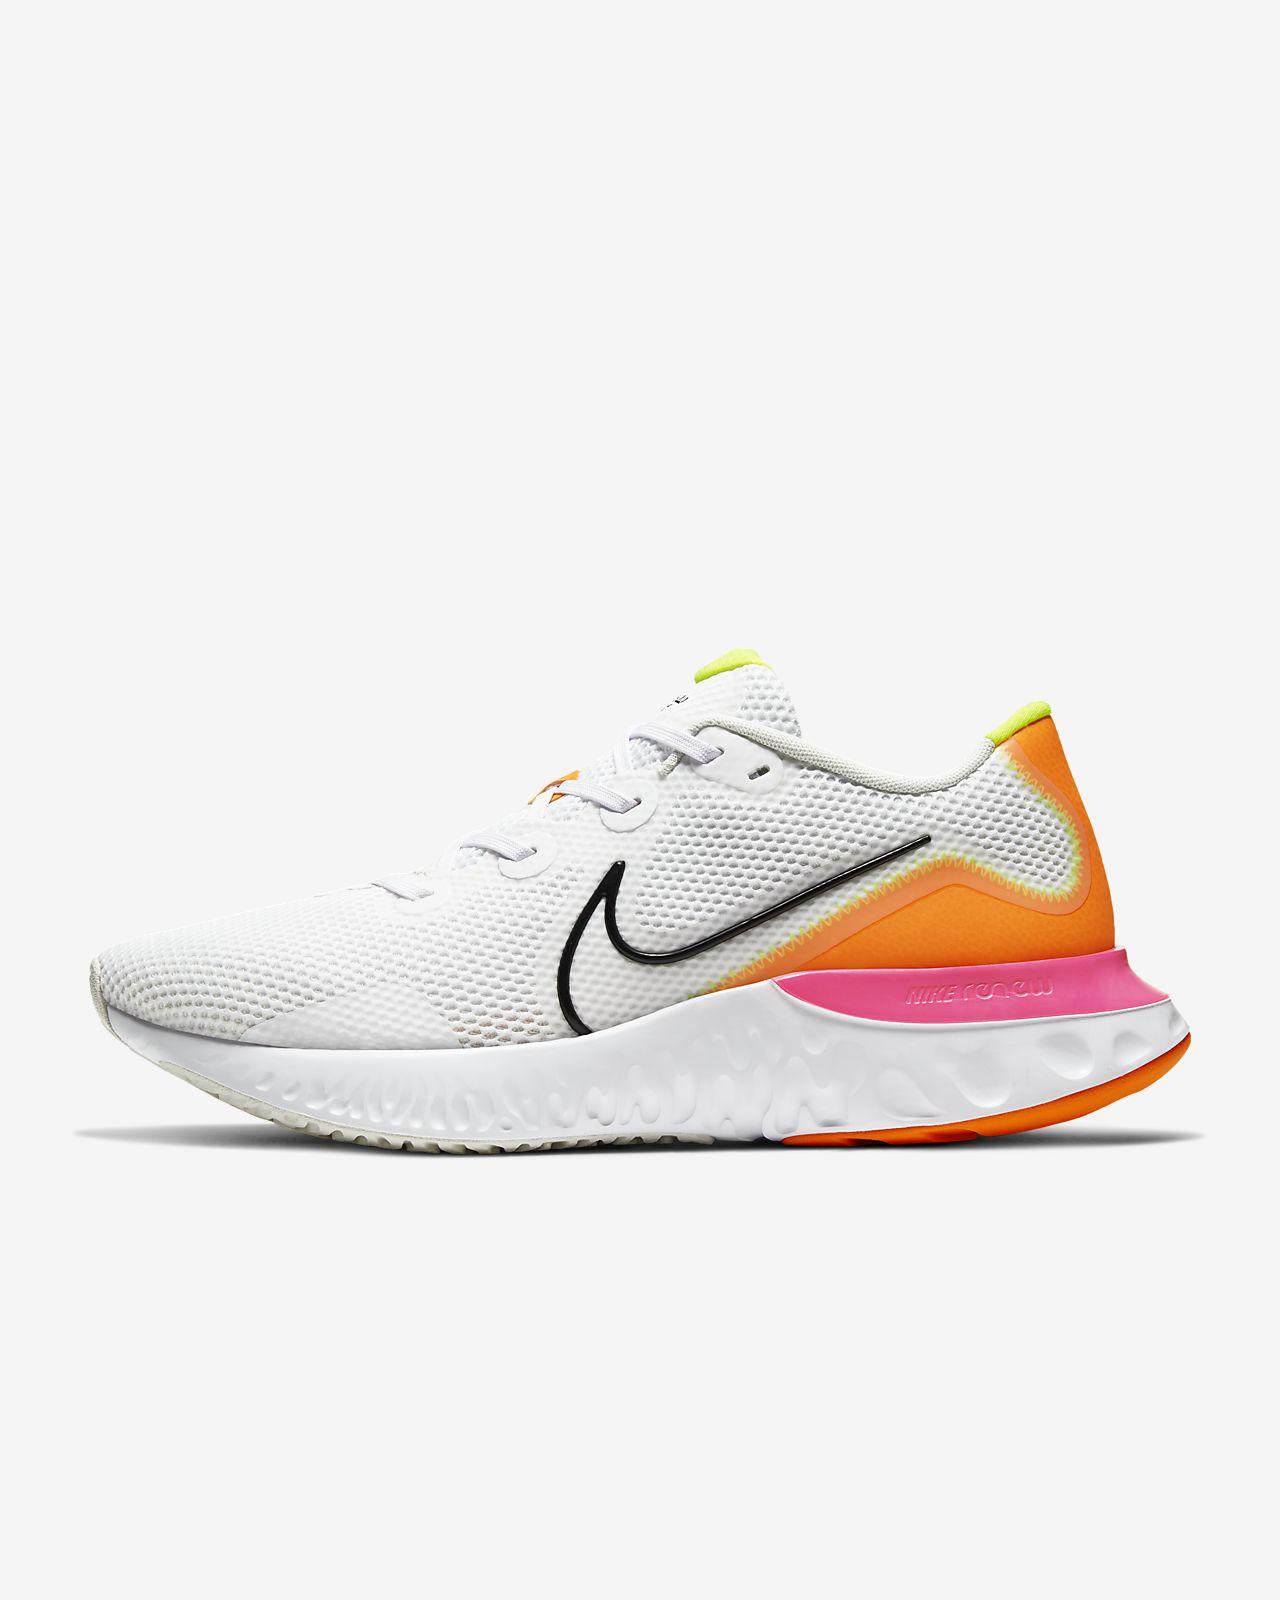 Nike Renew Run Men's Running Shoe